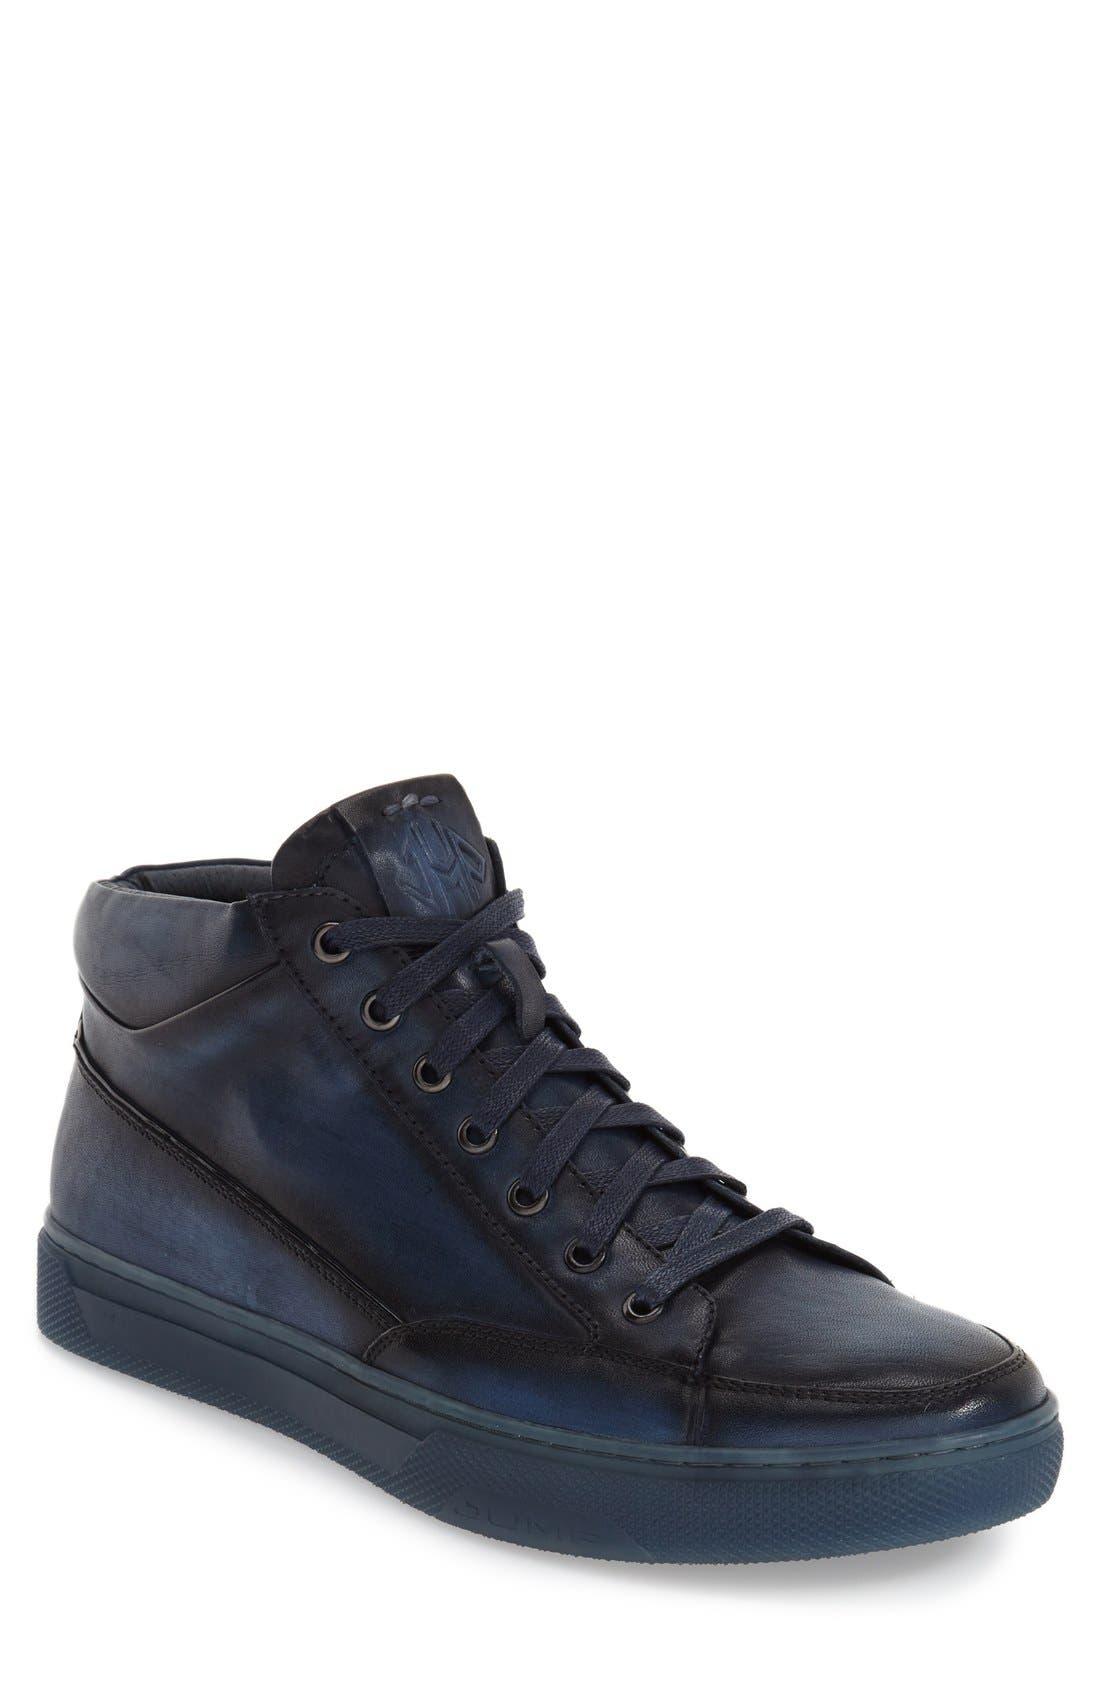 Alternate Image 1 Selected - Jump 'Strickland' Sneaker (Men)